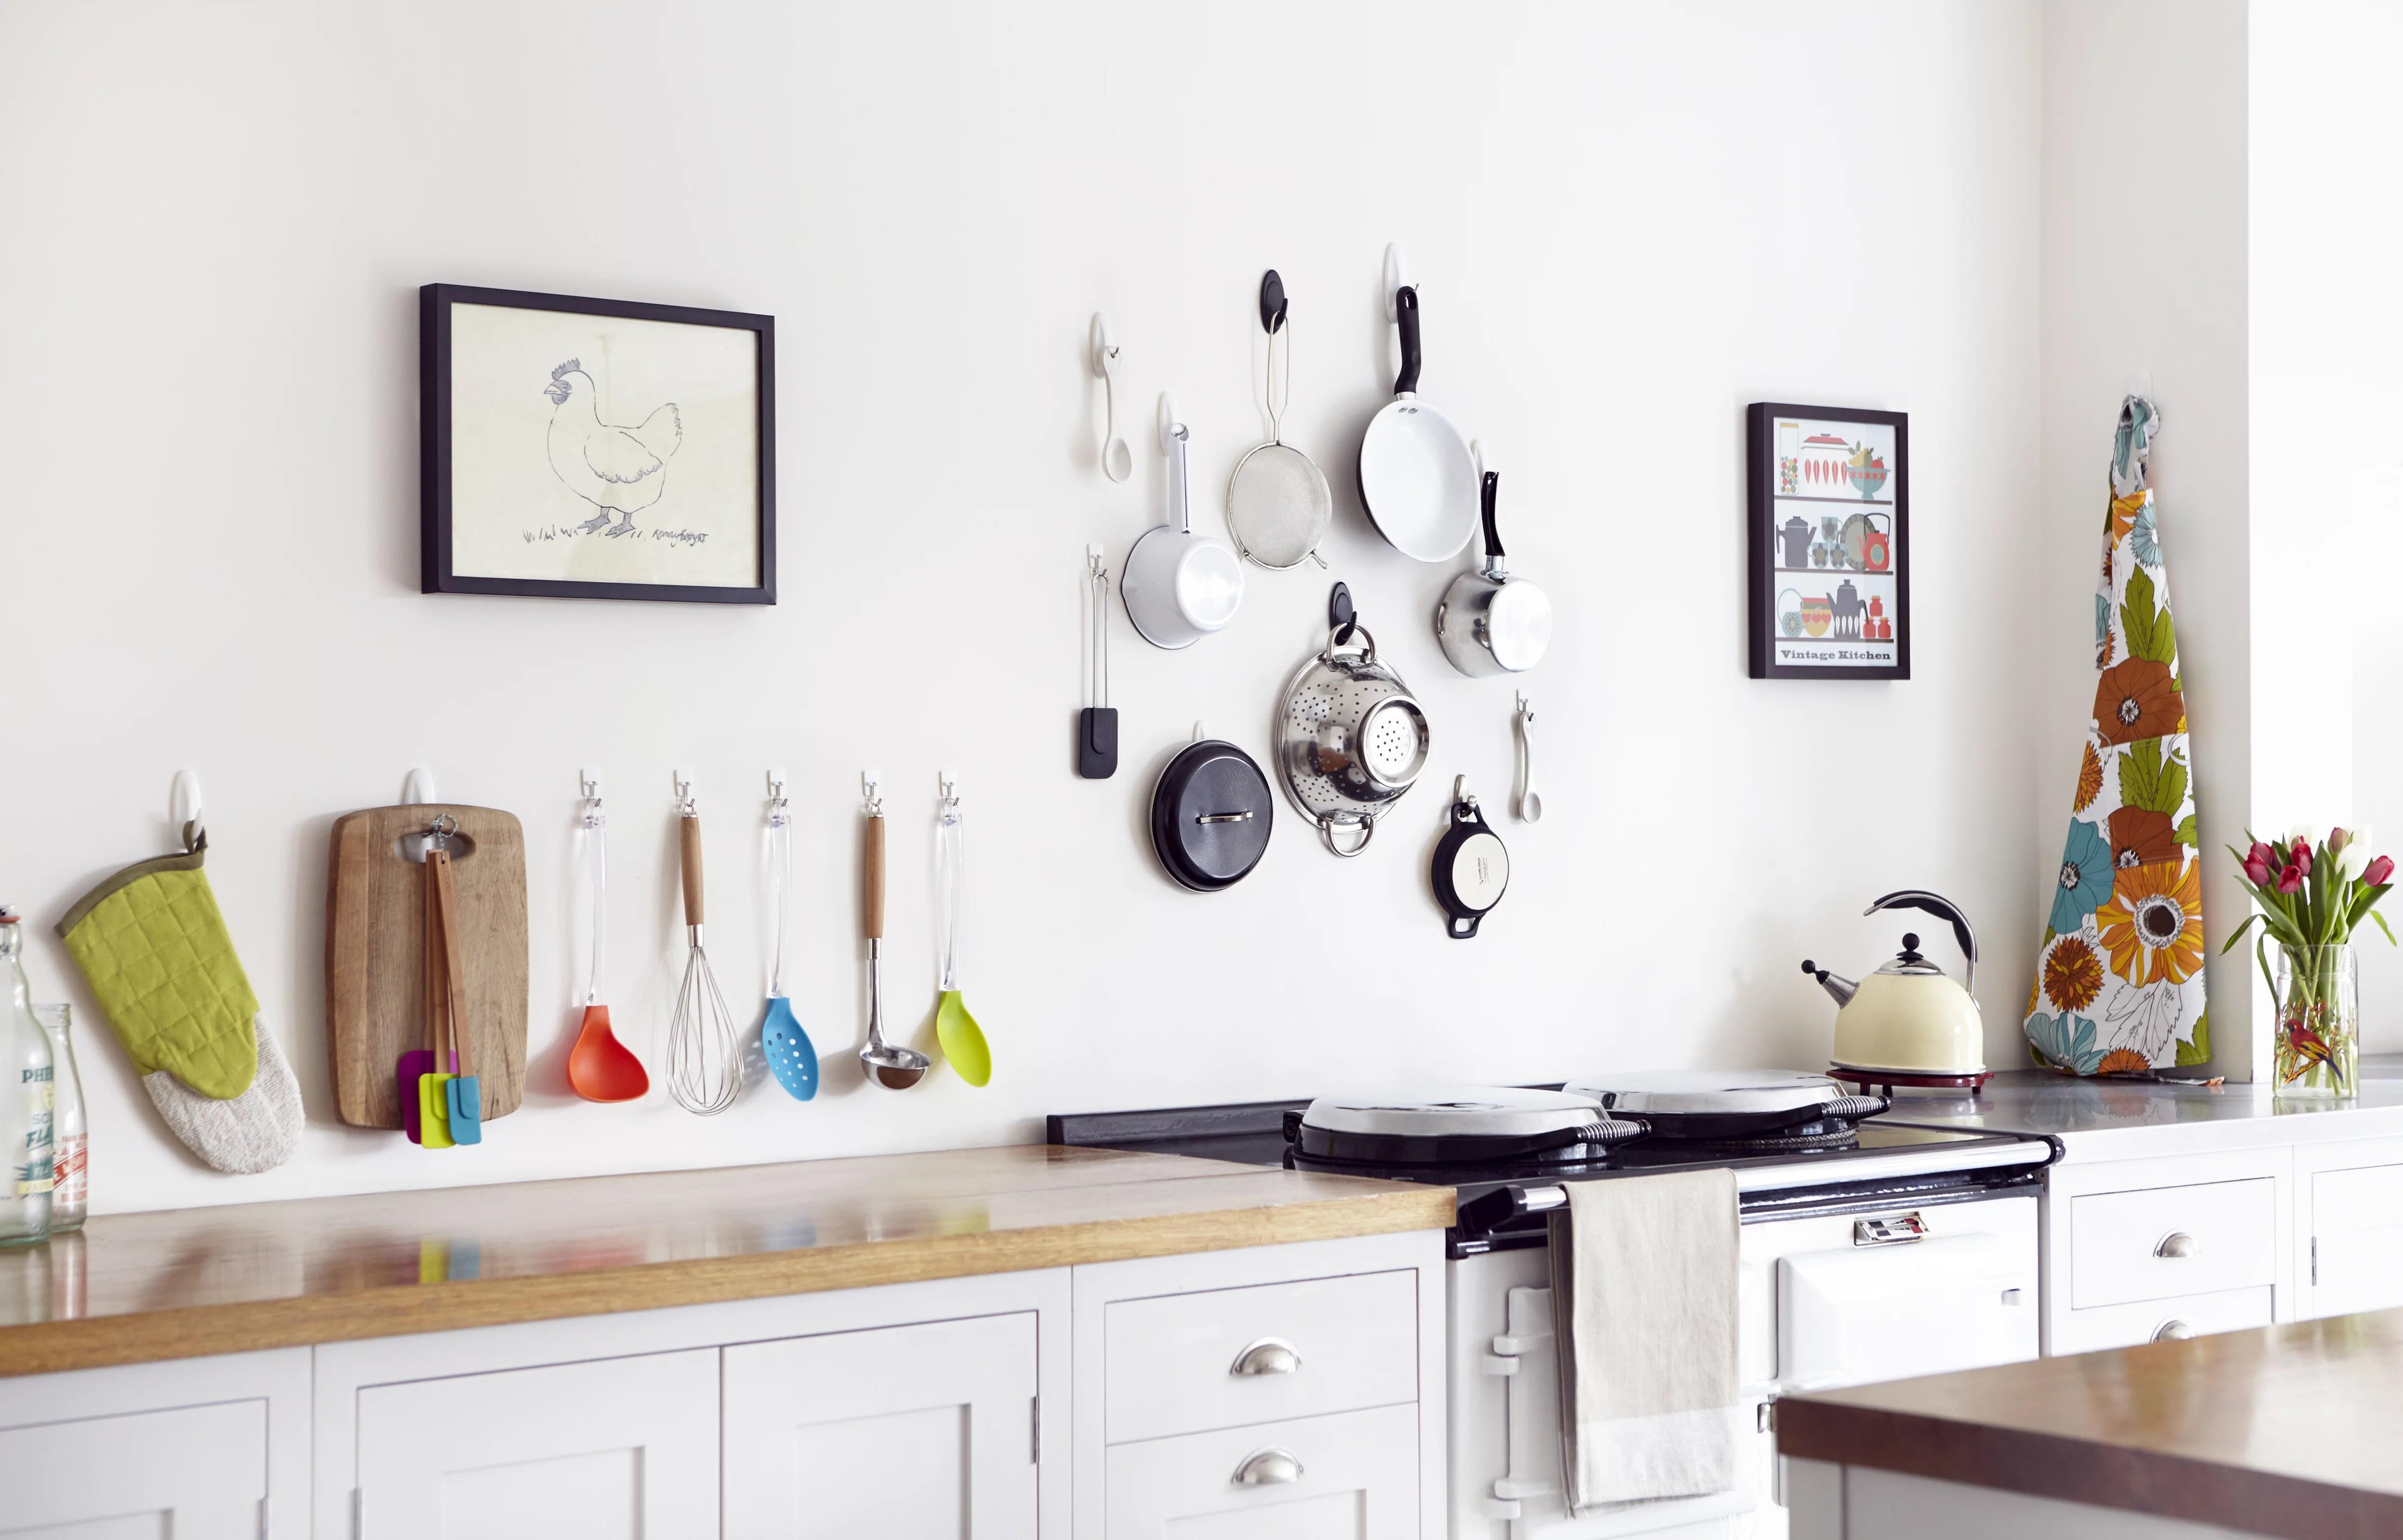 Brands  3m  Diy Home Improvement  Diy At B&q